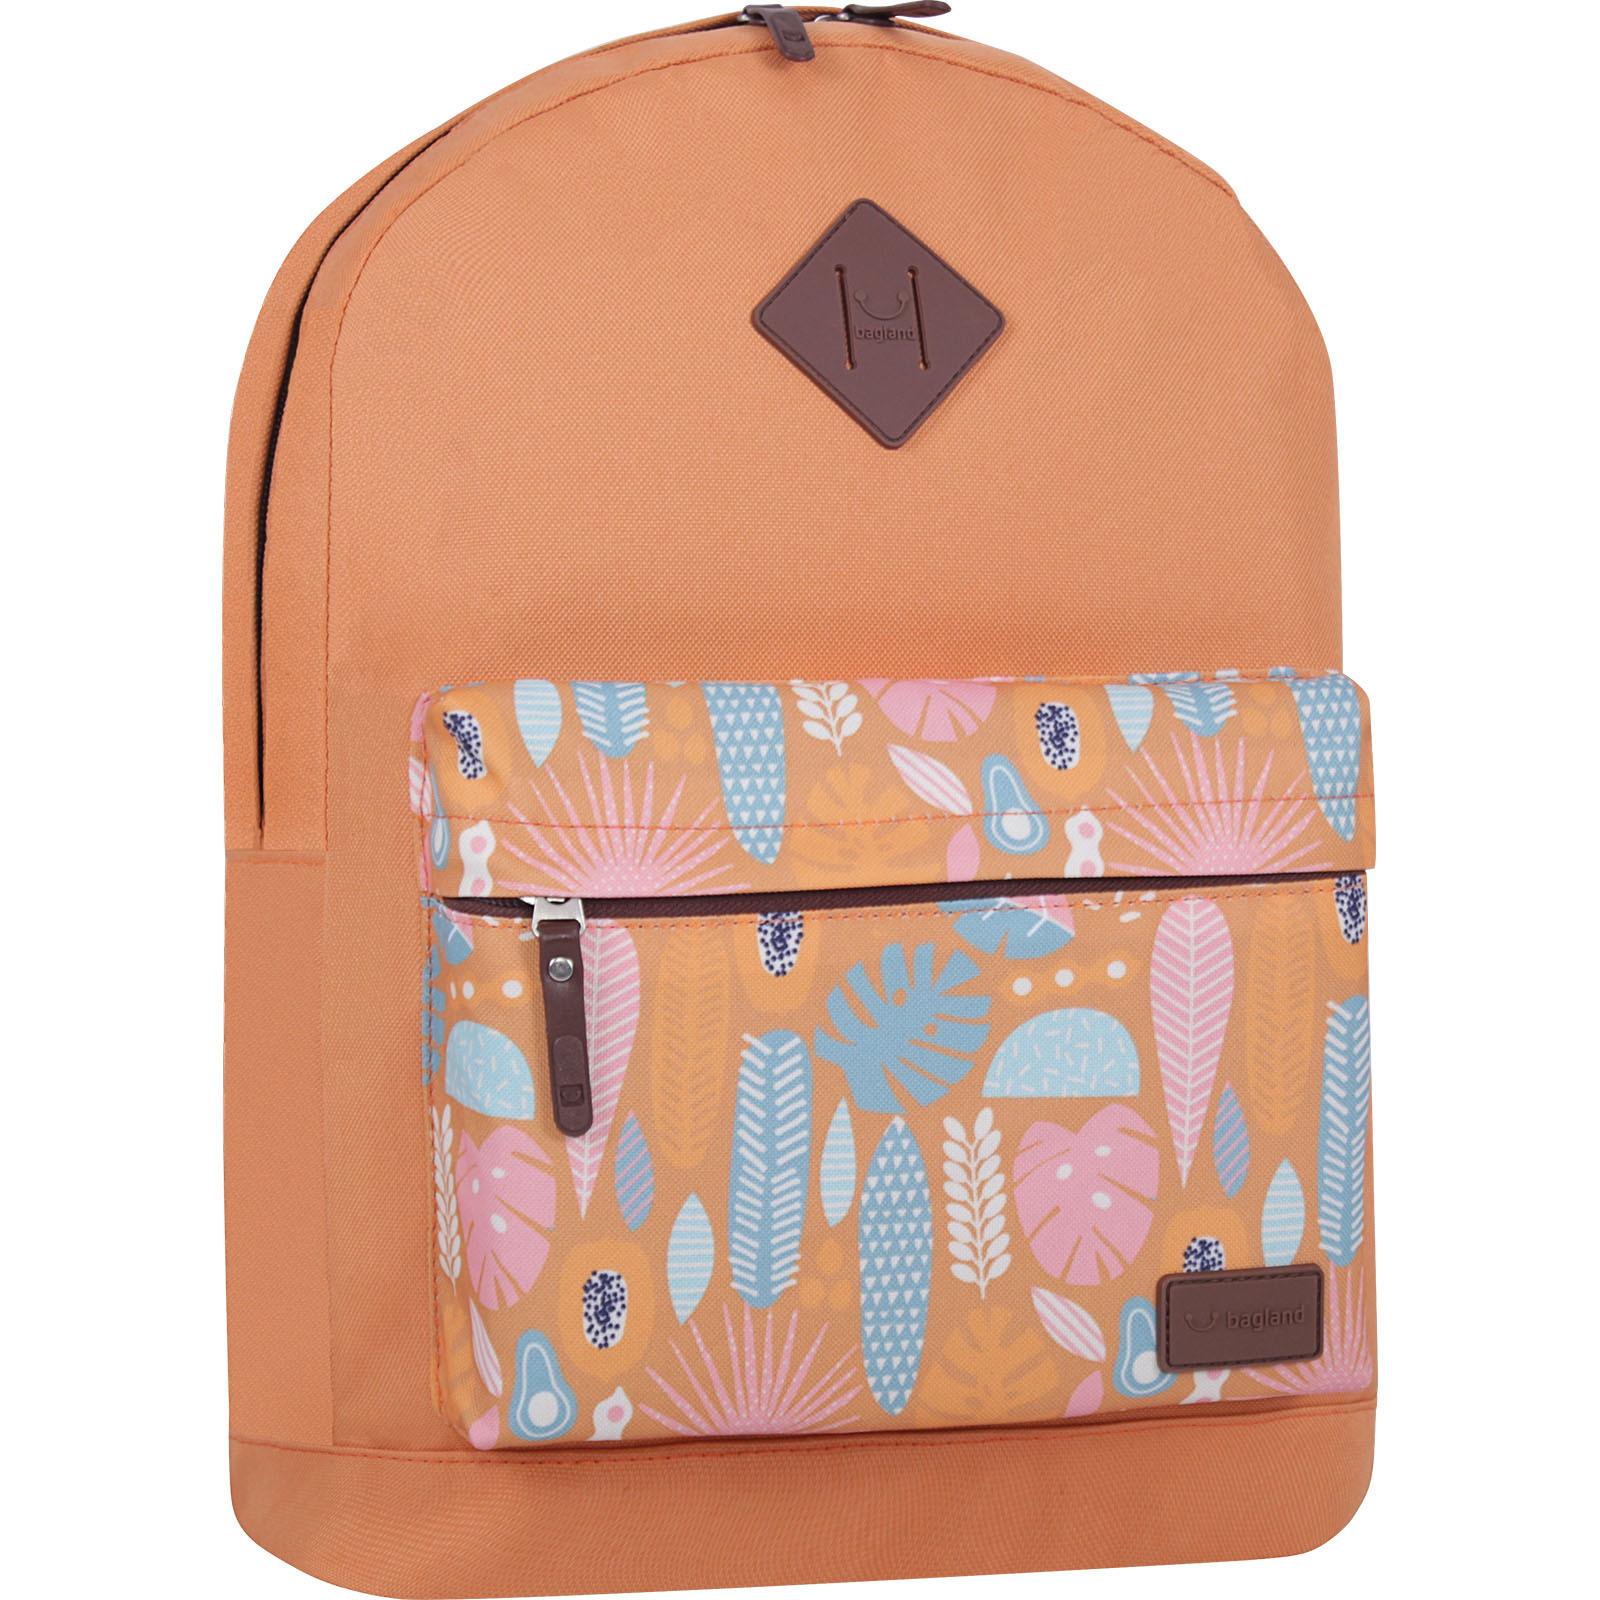 Молодежные рюкзаки Рюкзак Bagland Молодежный W/R 17 л. Рыжий 746 (00533662) IMG_7329_суб746_-1600.jpg